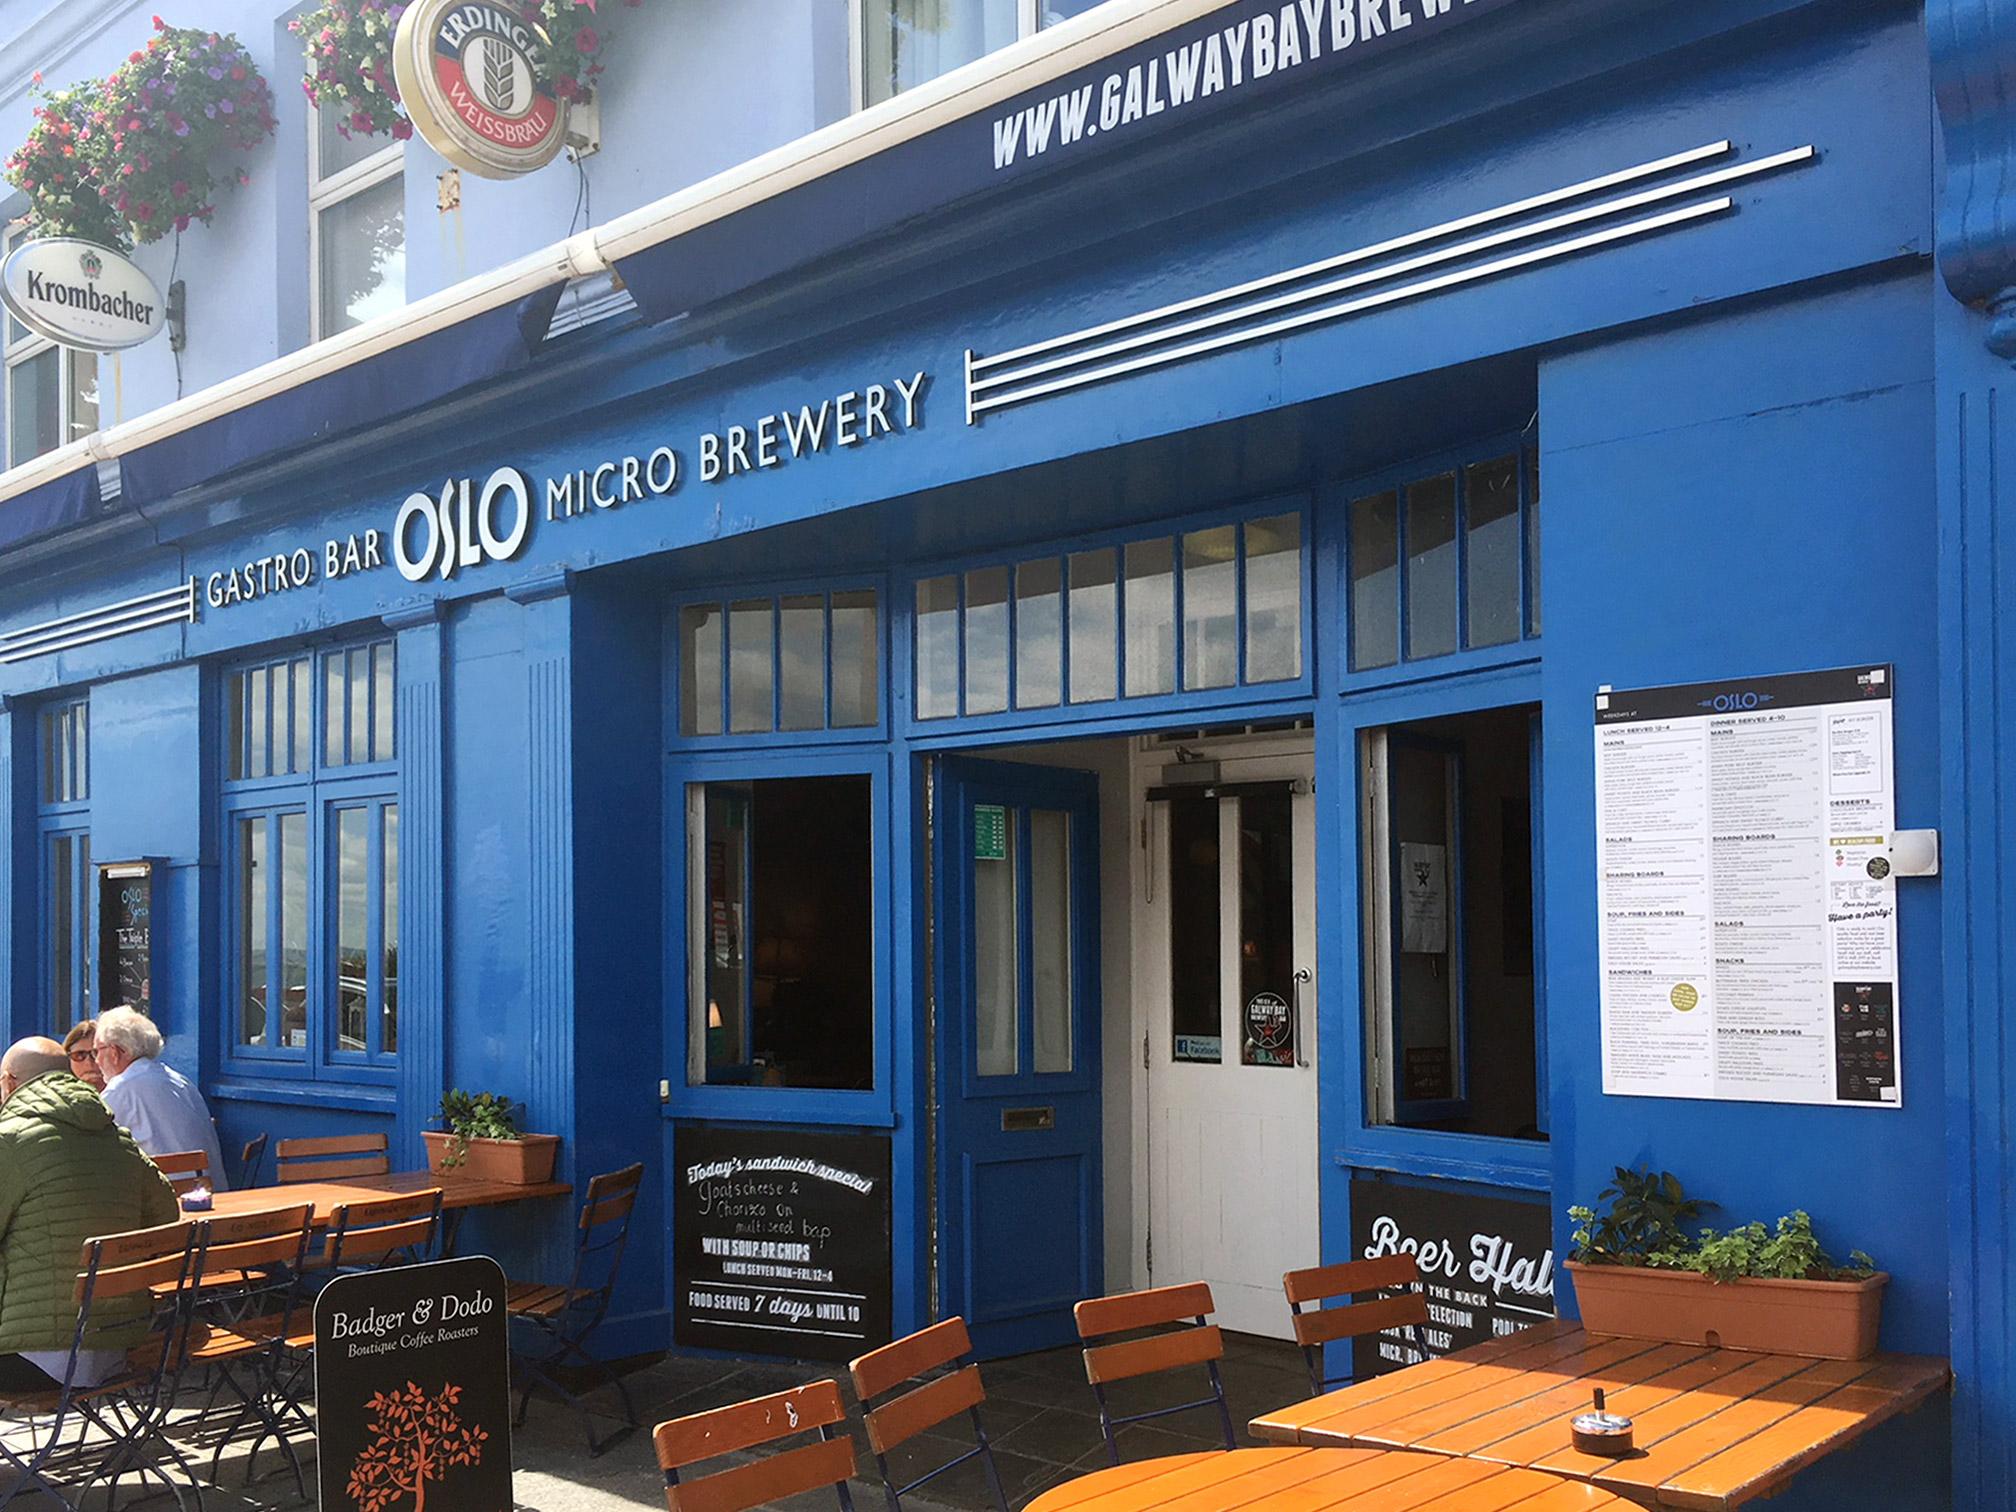 DETOUR: Galway, Ireland – Galway Bay Brewery